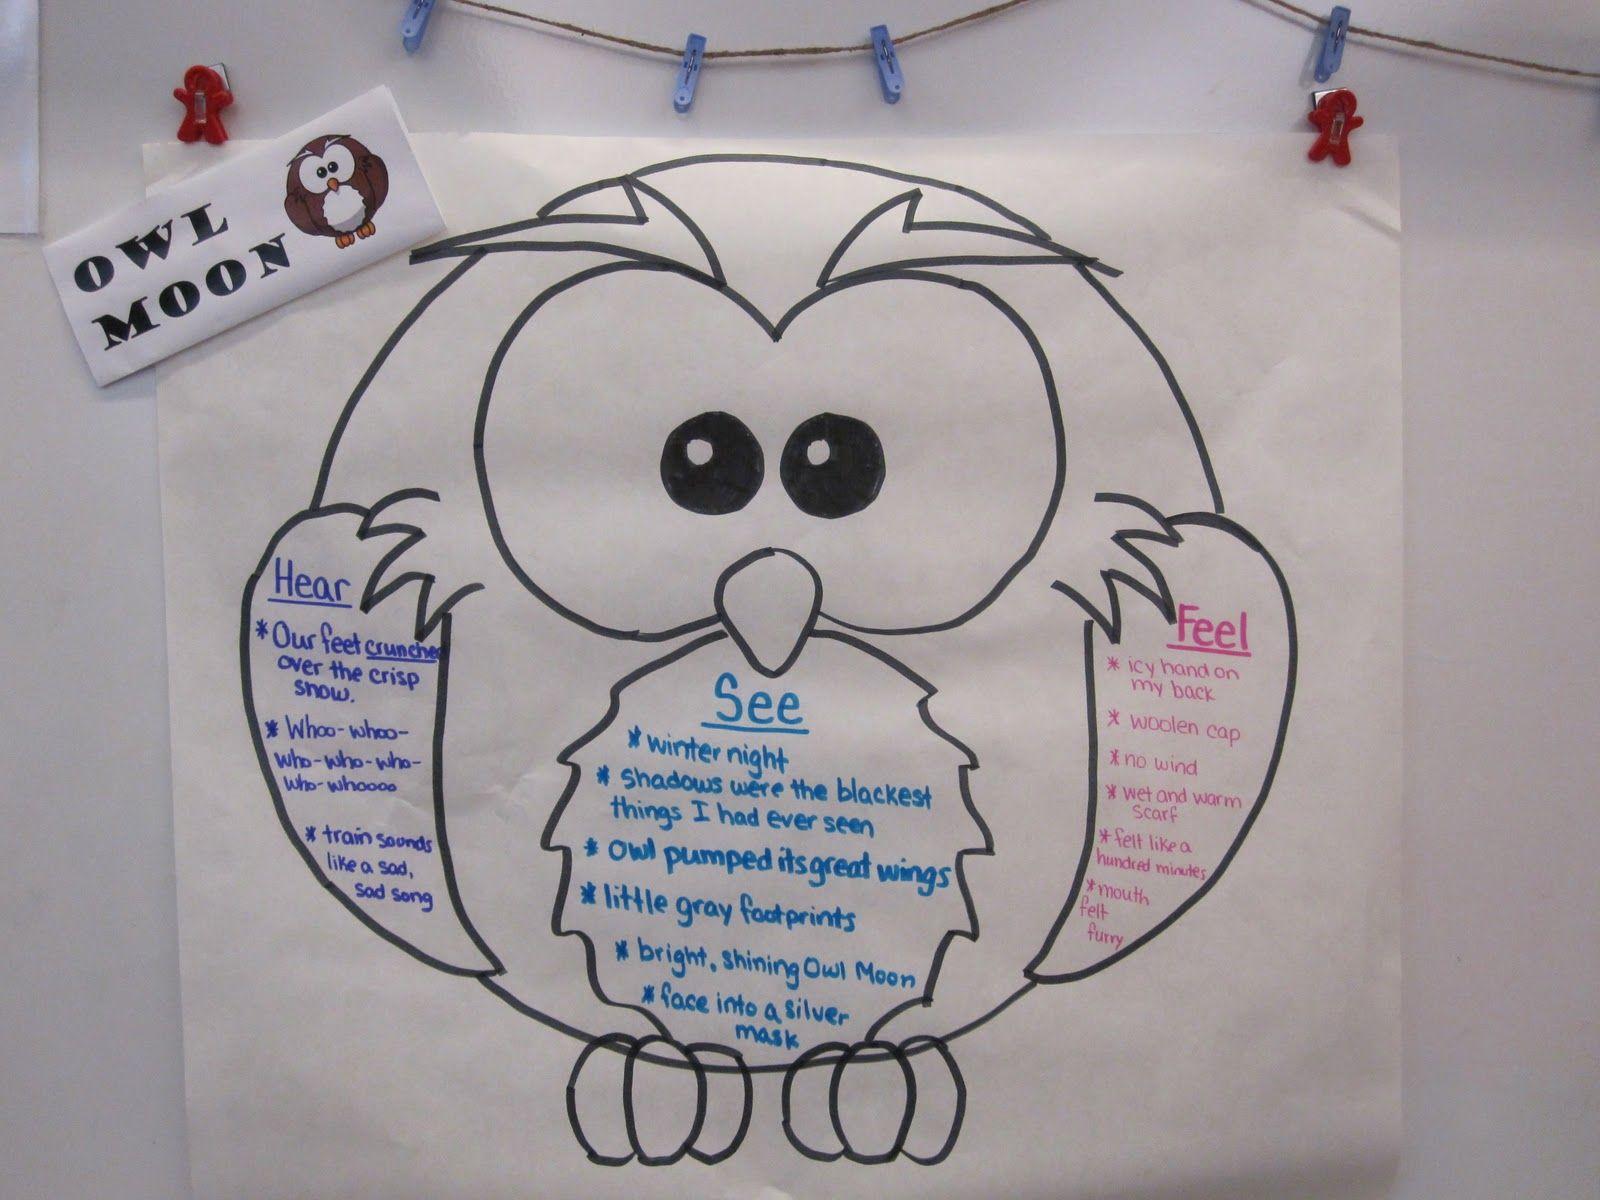 Owlmoon Graphic Organizer